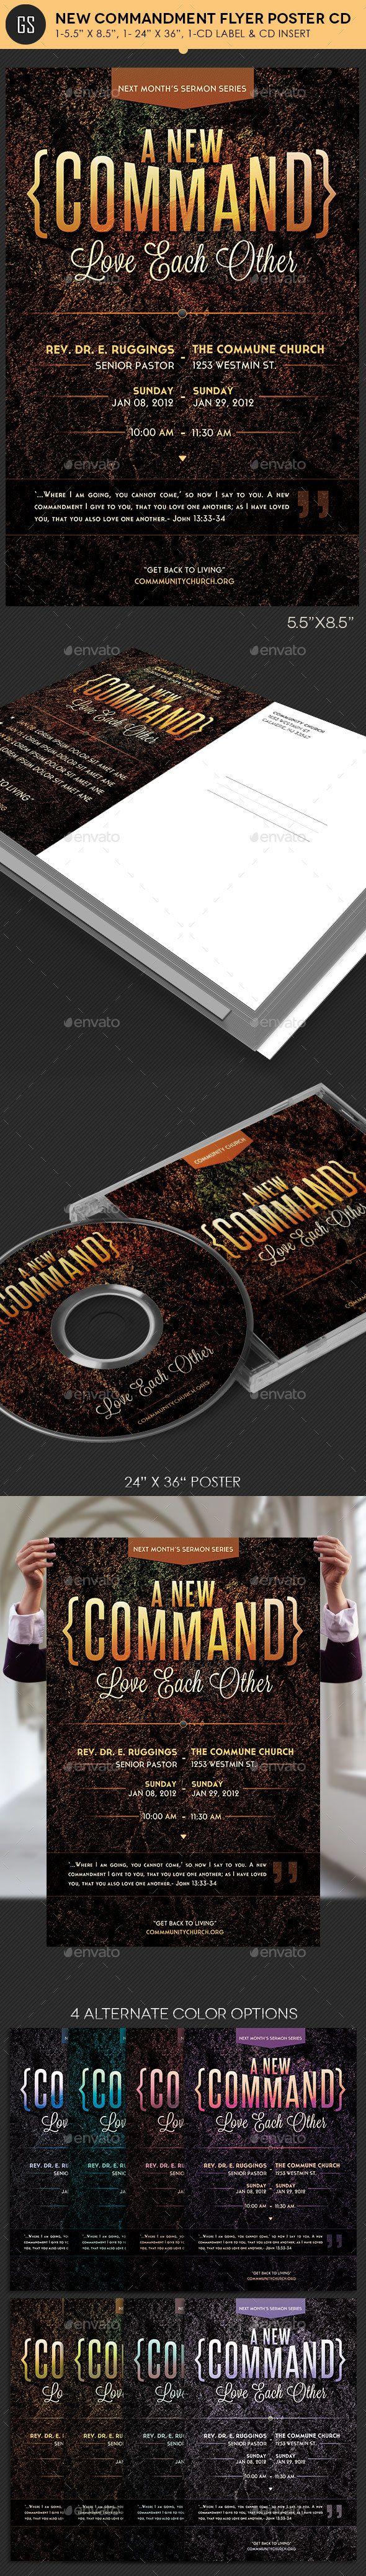 New Commandment Flyer Poster CD Template | Cd etiketten, Audio ...